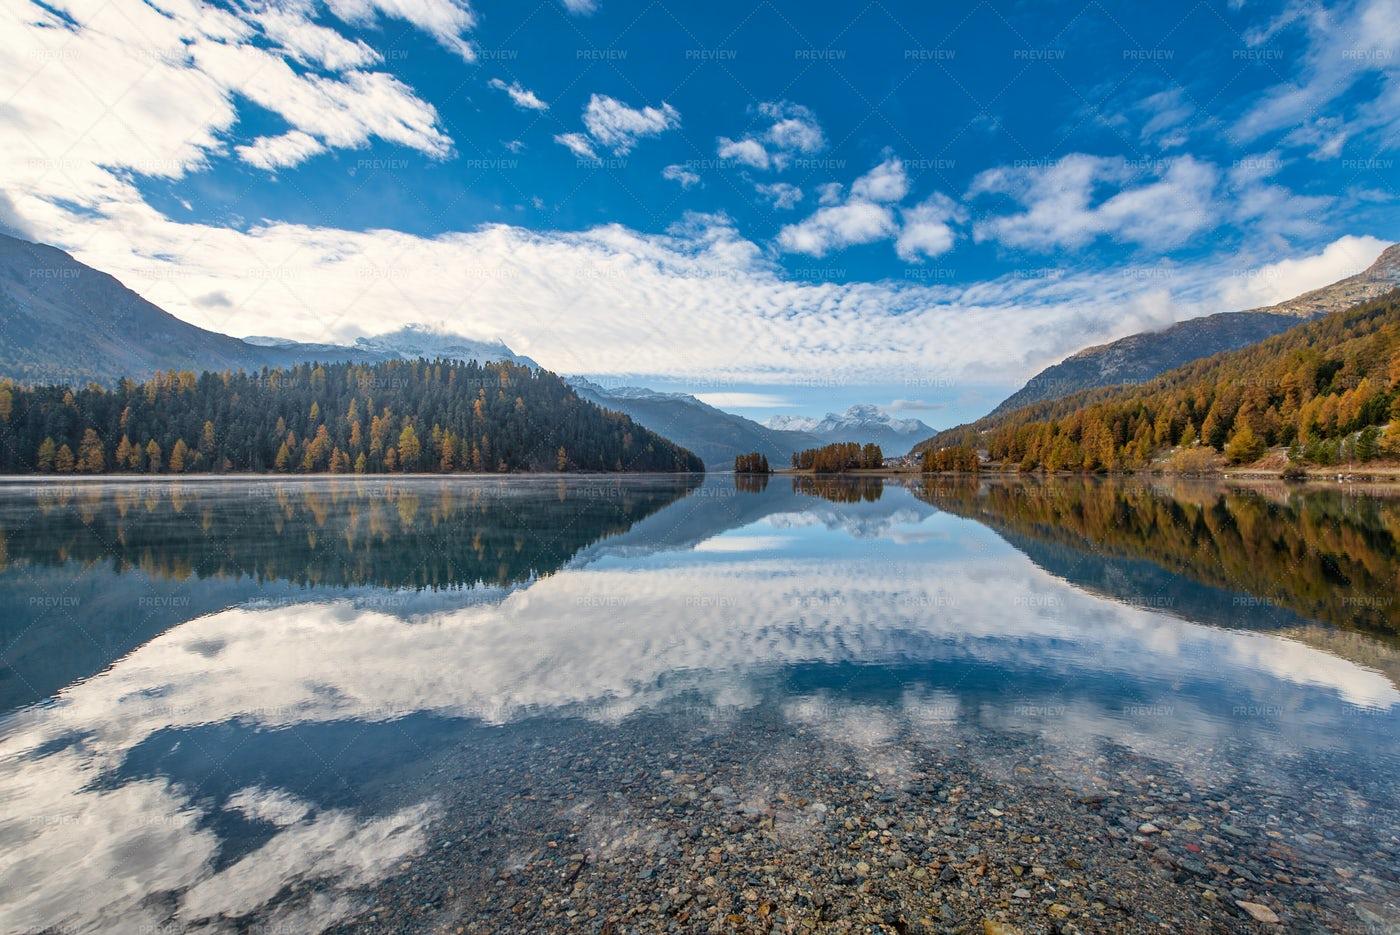 Mountain Landscape With A Lake: Stock Photos